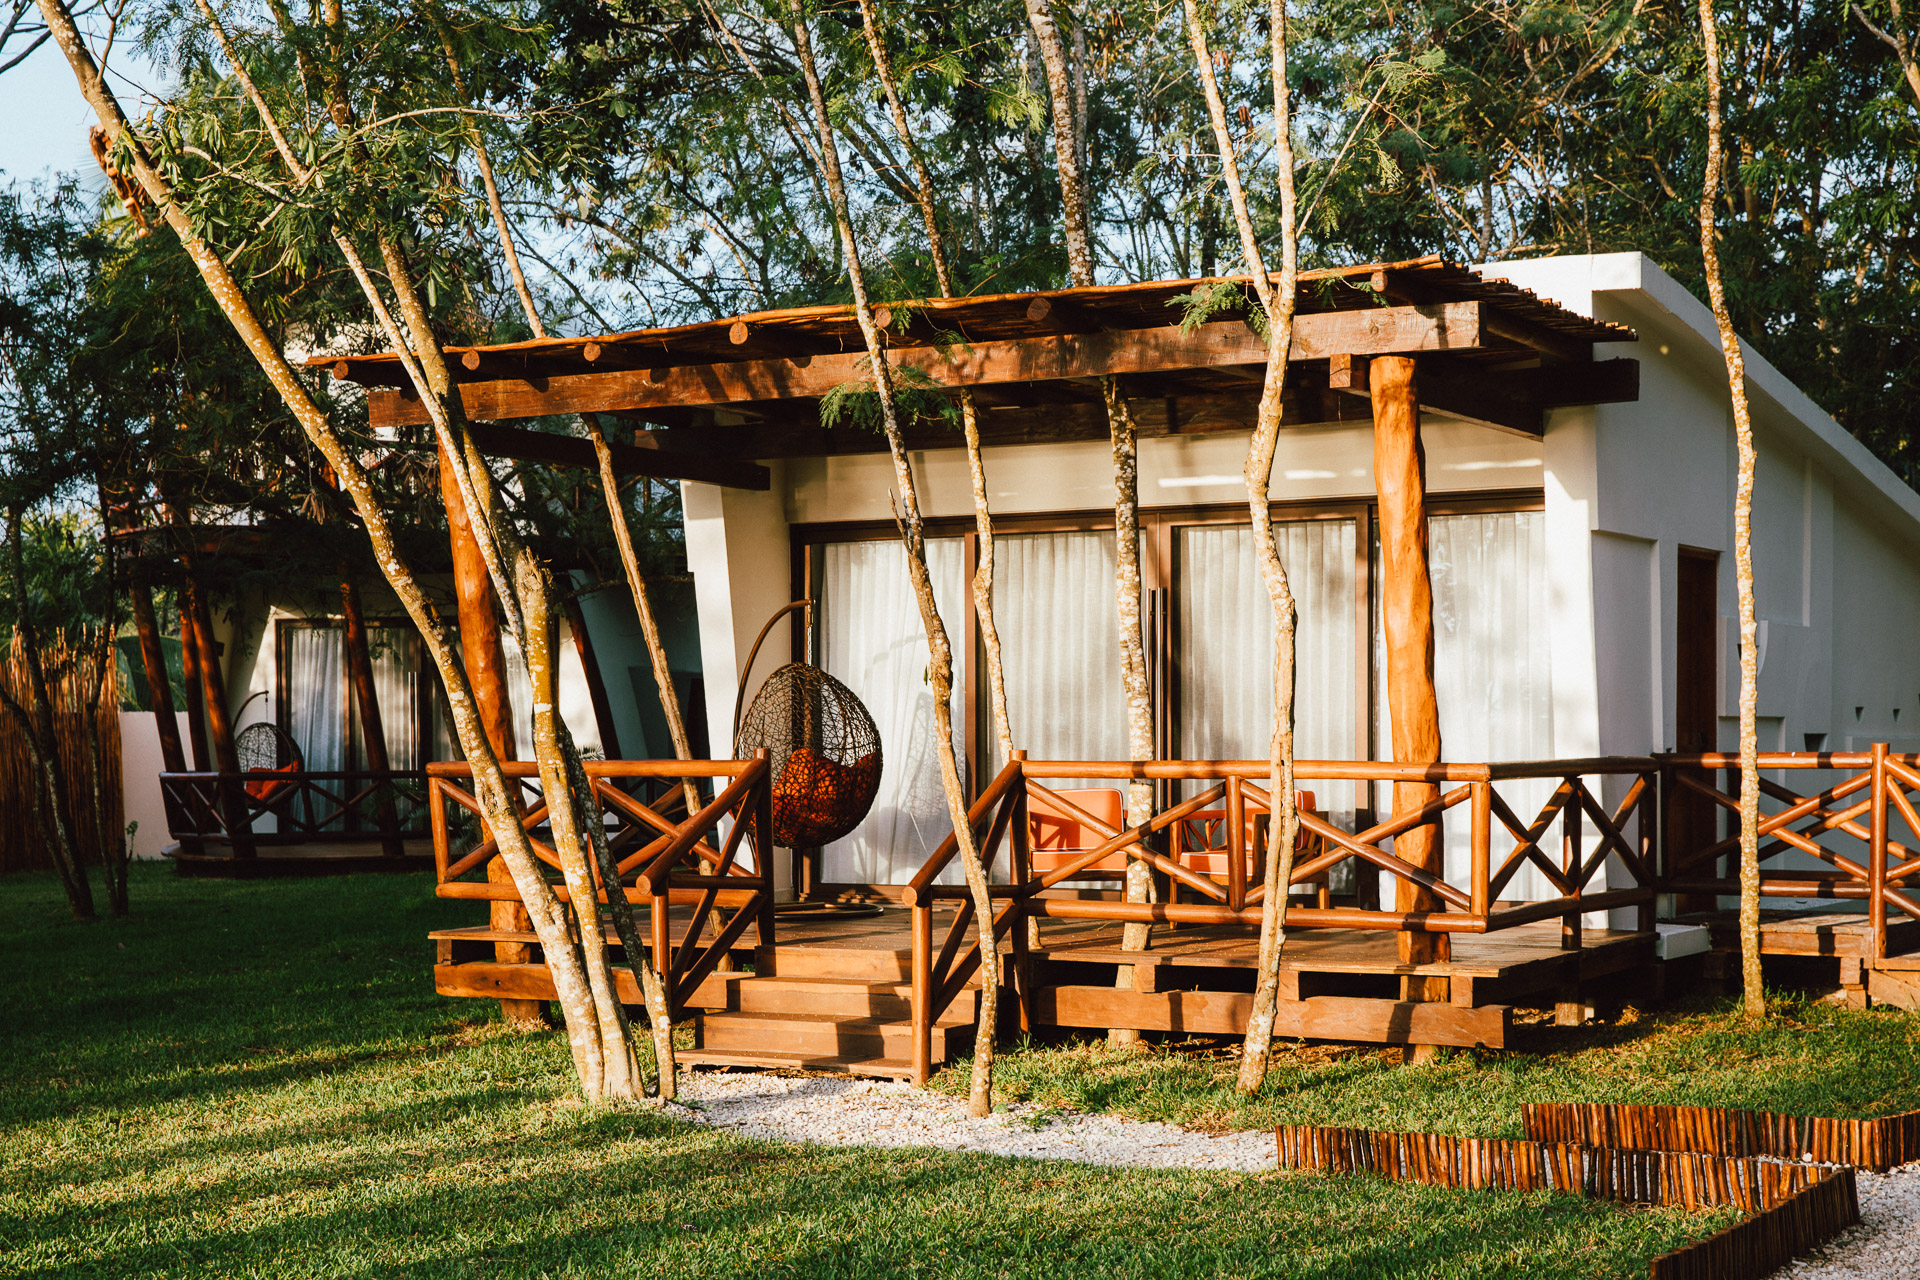 mexico-luxury-hotel-photographer-riviera-maya-mia-bacalar-8.jpg